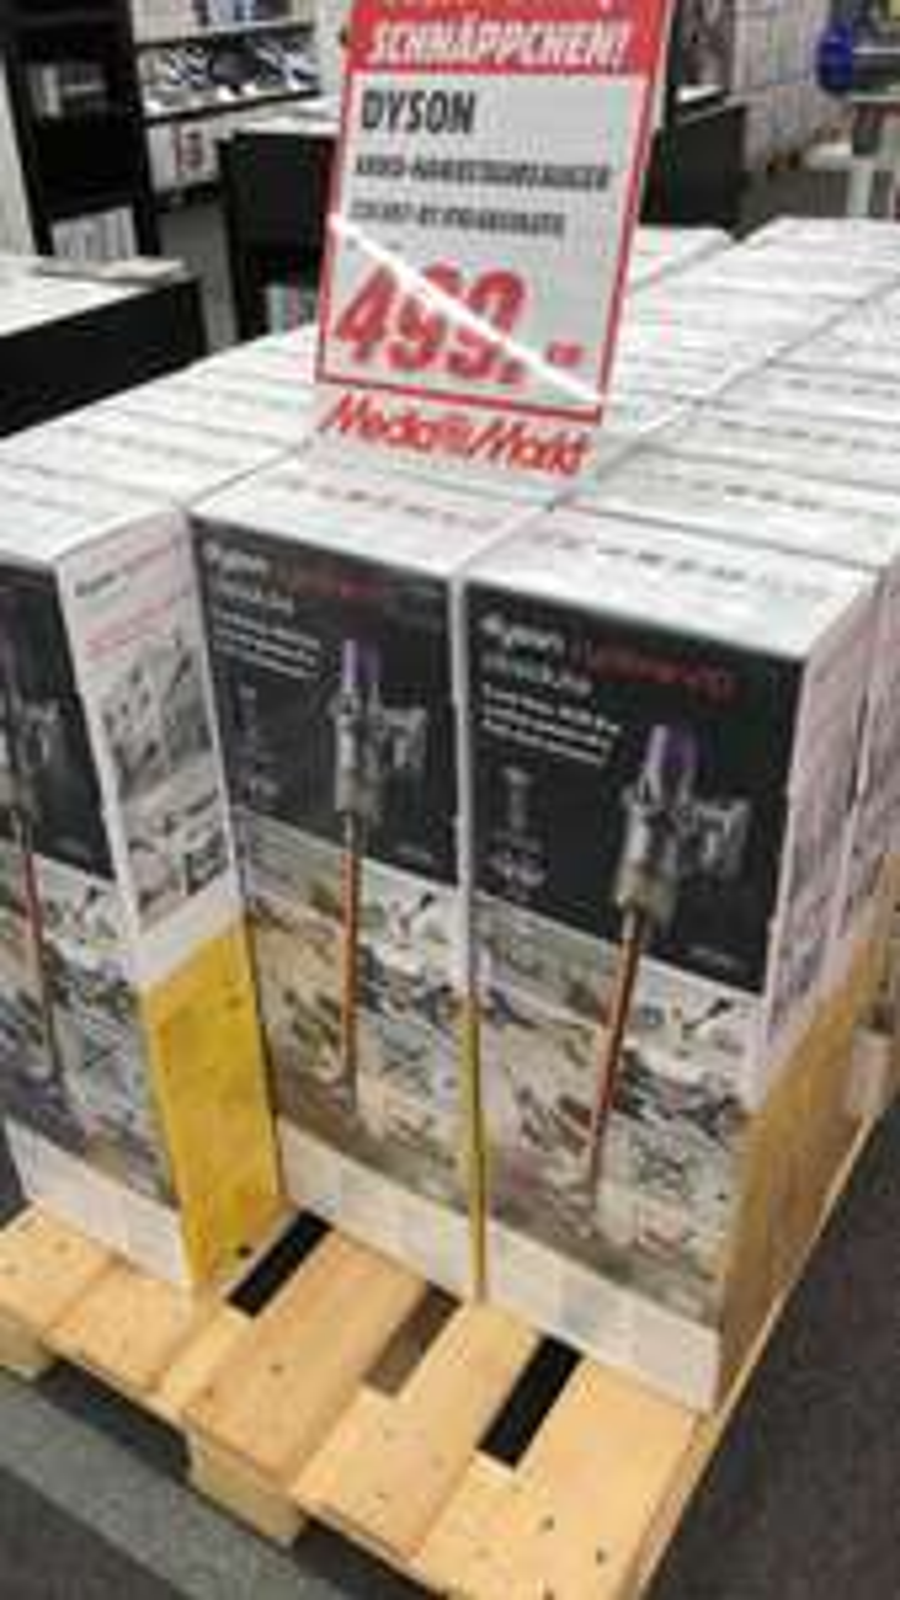 Lokal Media Markt Heilbronn Dyson cyclone V10 absolute